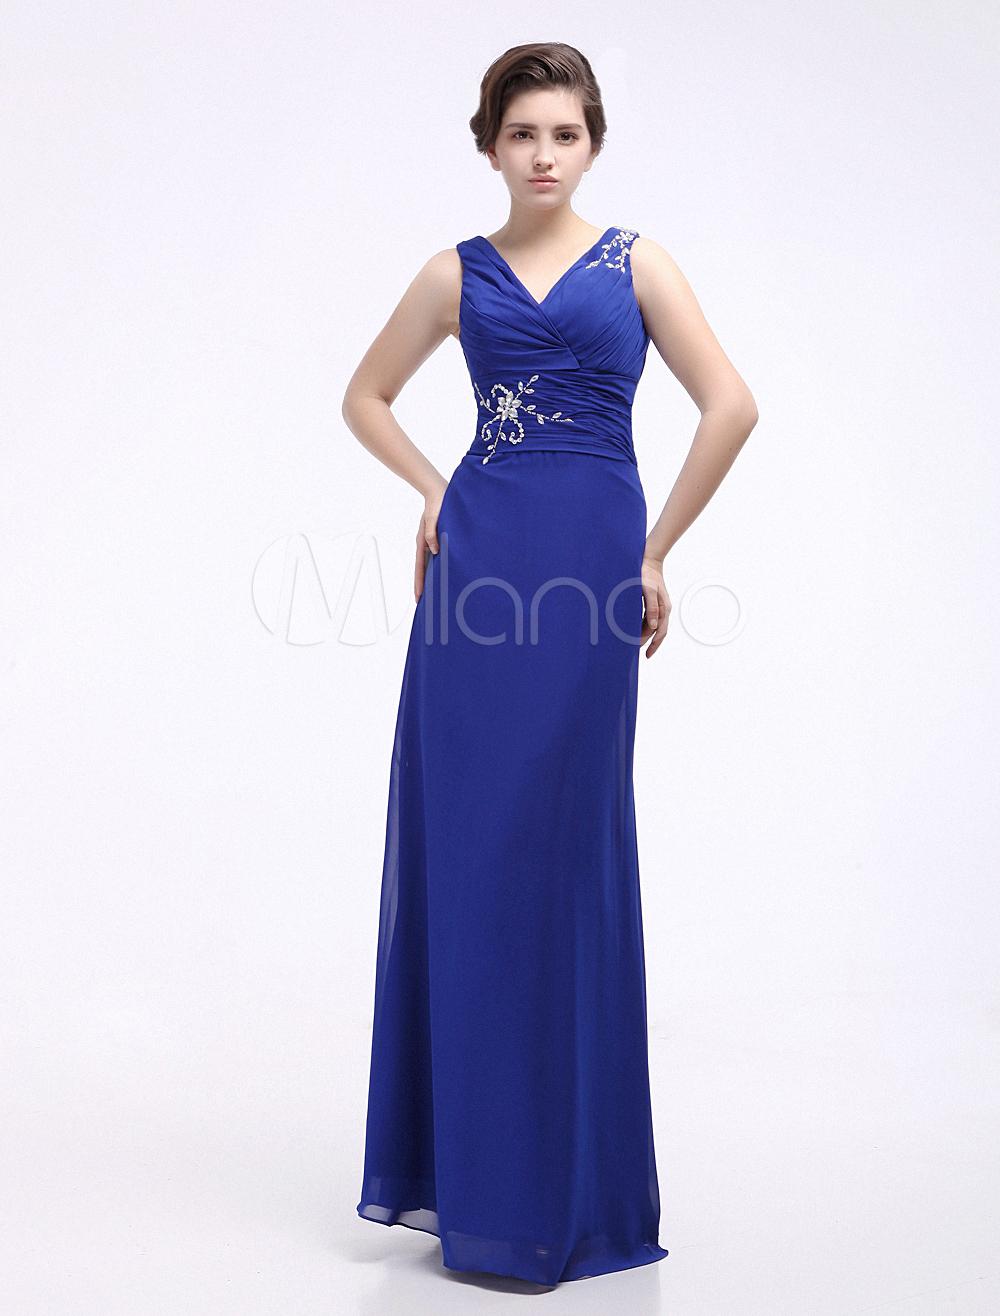 Elegant Royal Blue Chiffon Beading V-Neck Women's Evening Dress